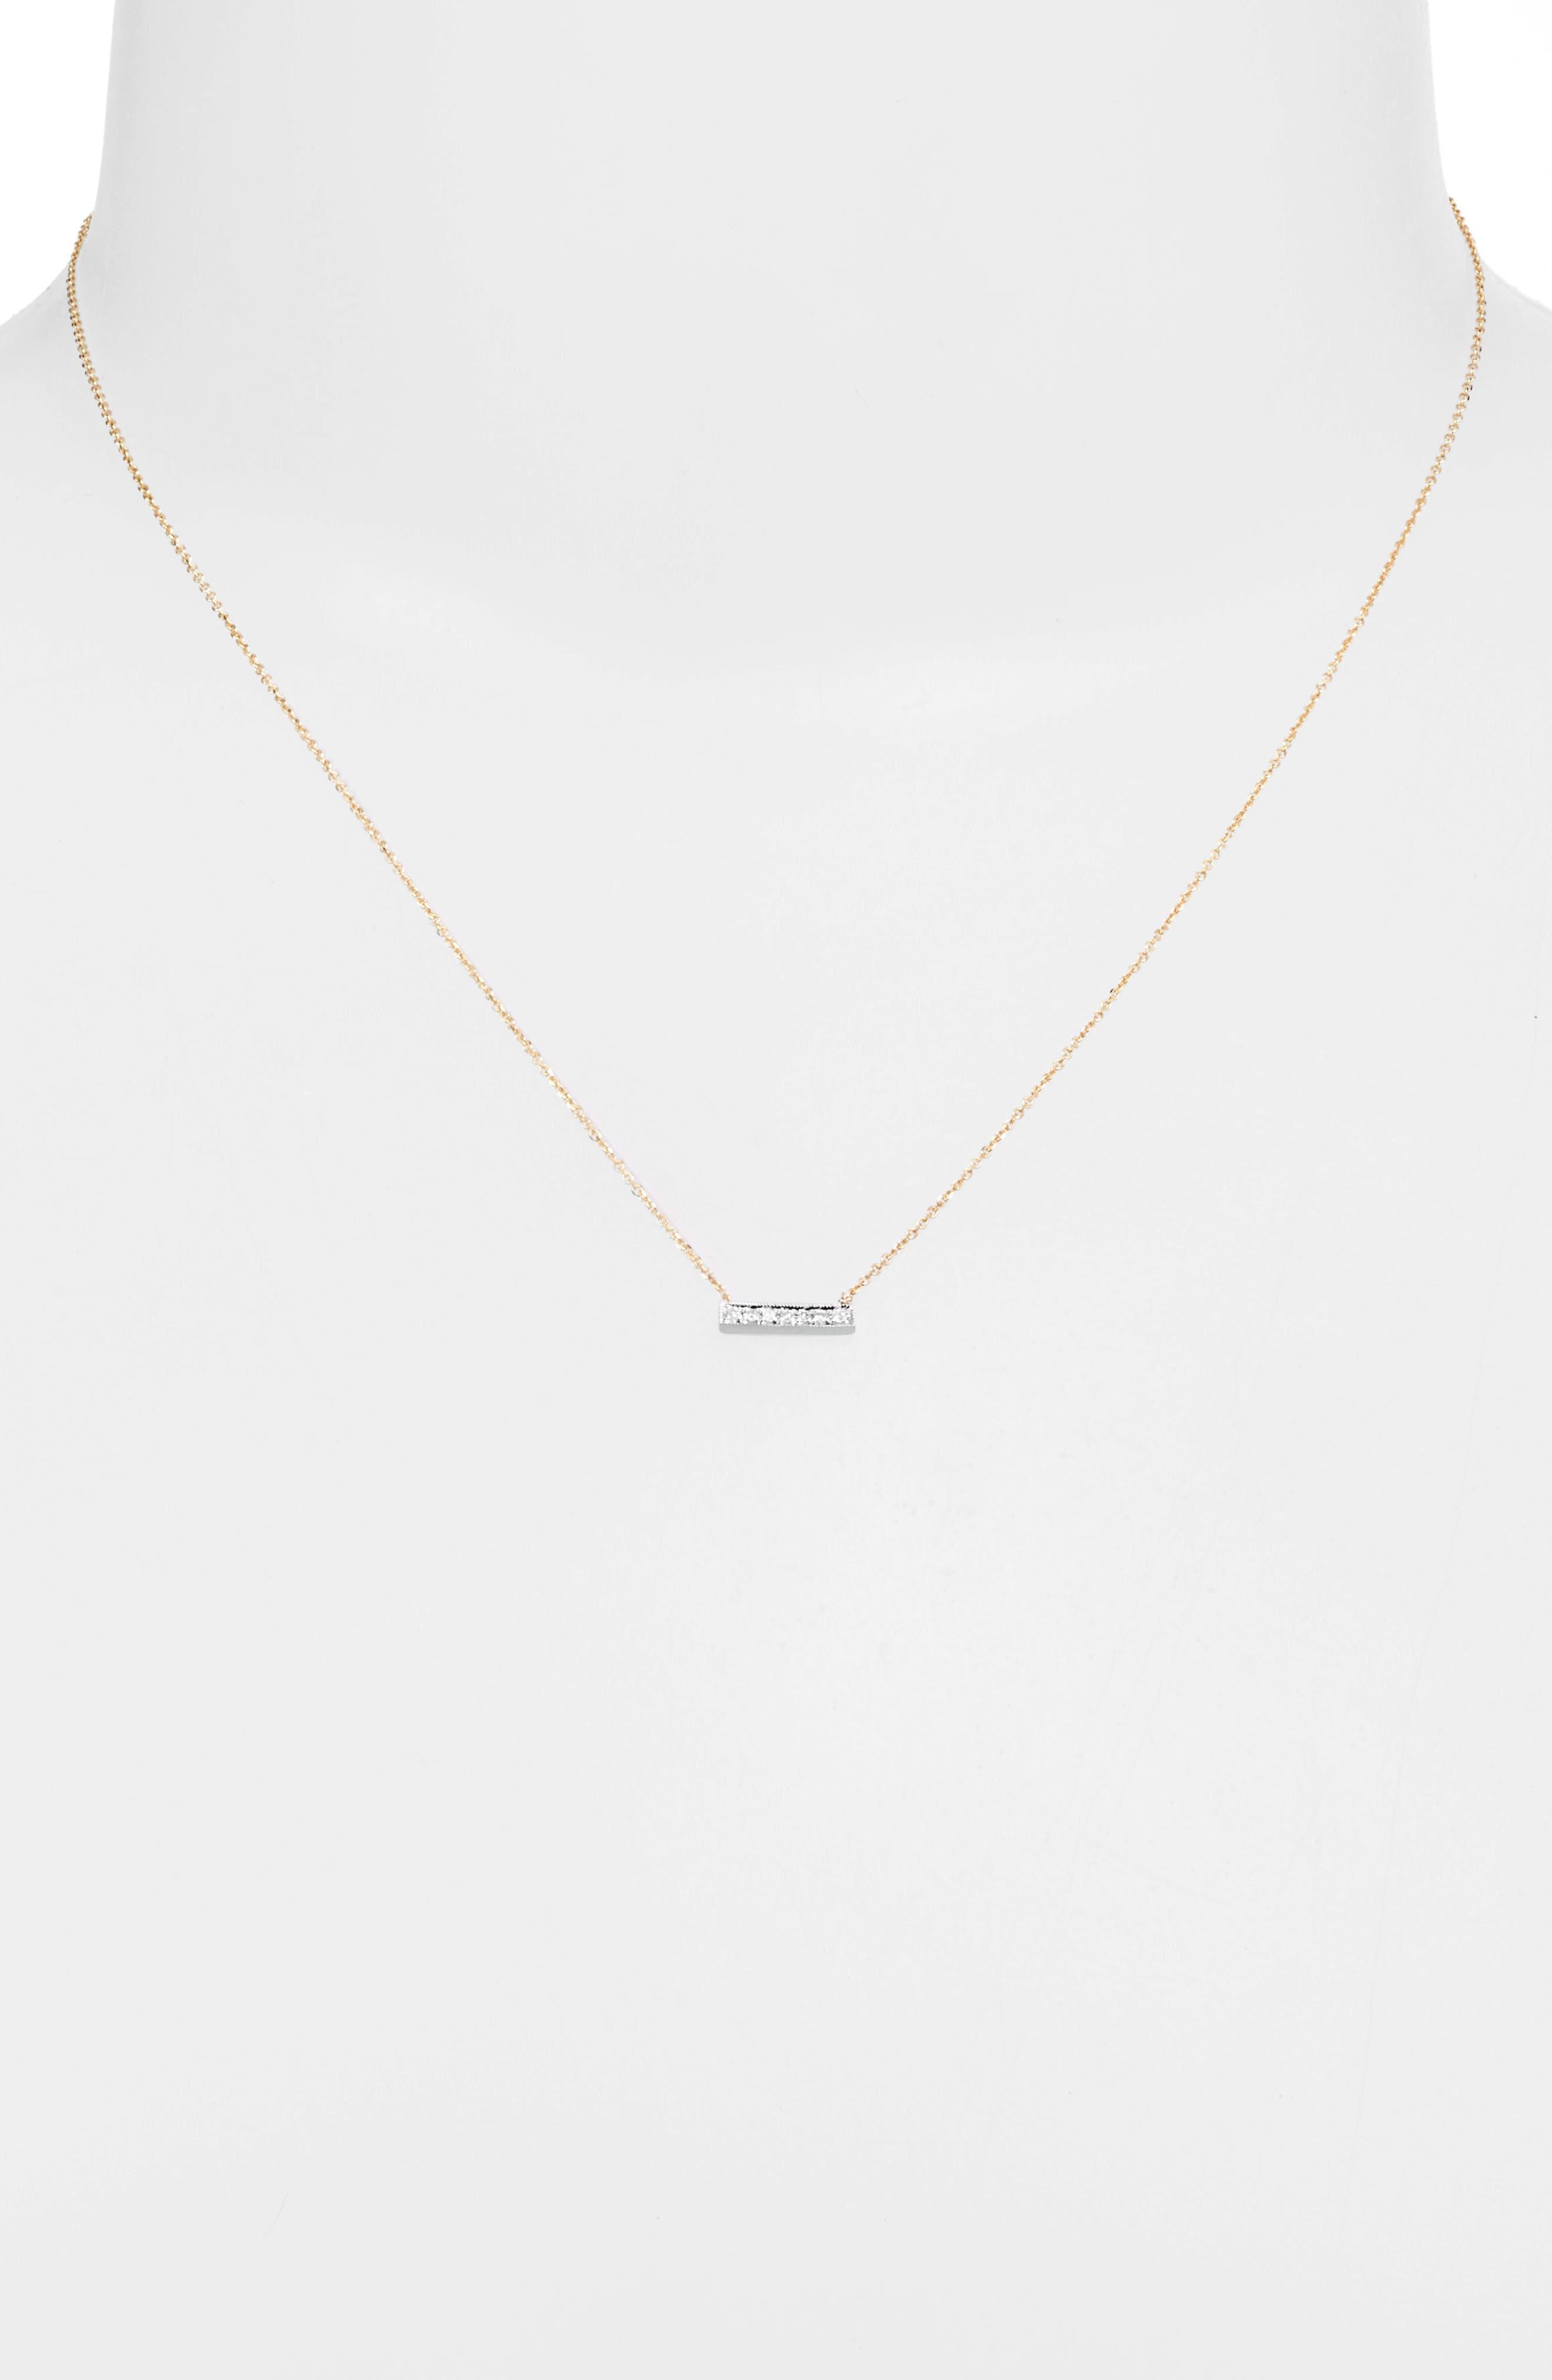 DANA REBECCA DESIGNS, 'Sylvie Rose' Diamond Bar Pendant Necklace, Alternate thumbnail 3, color, YELLOW GOLD